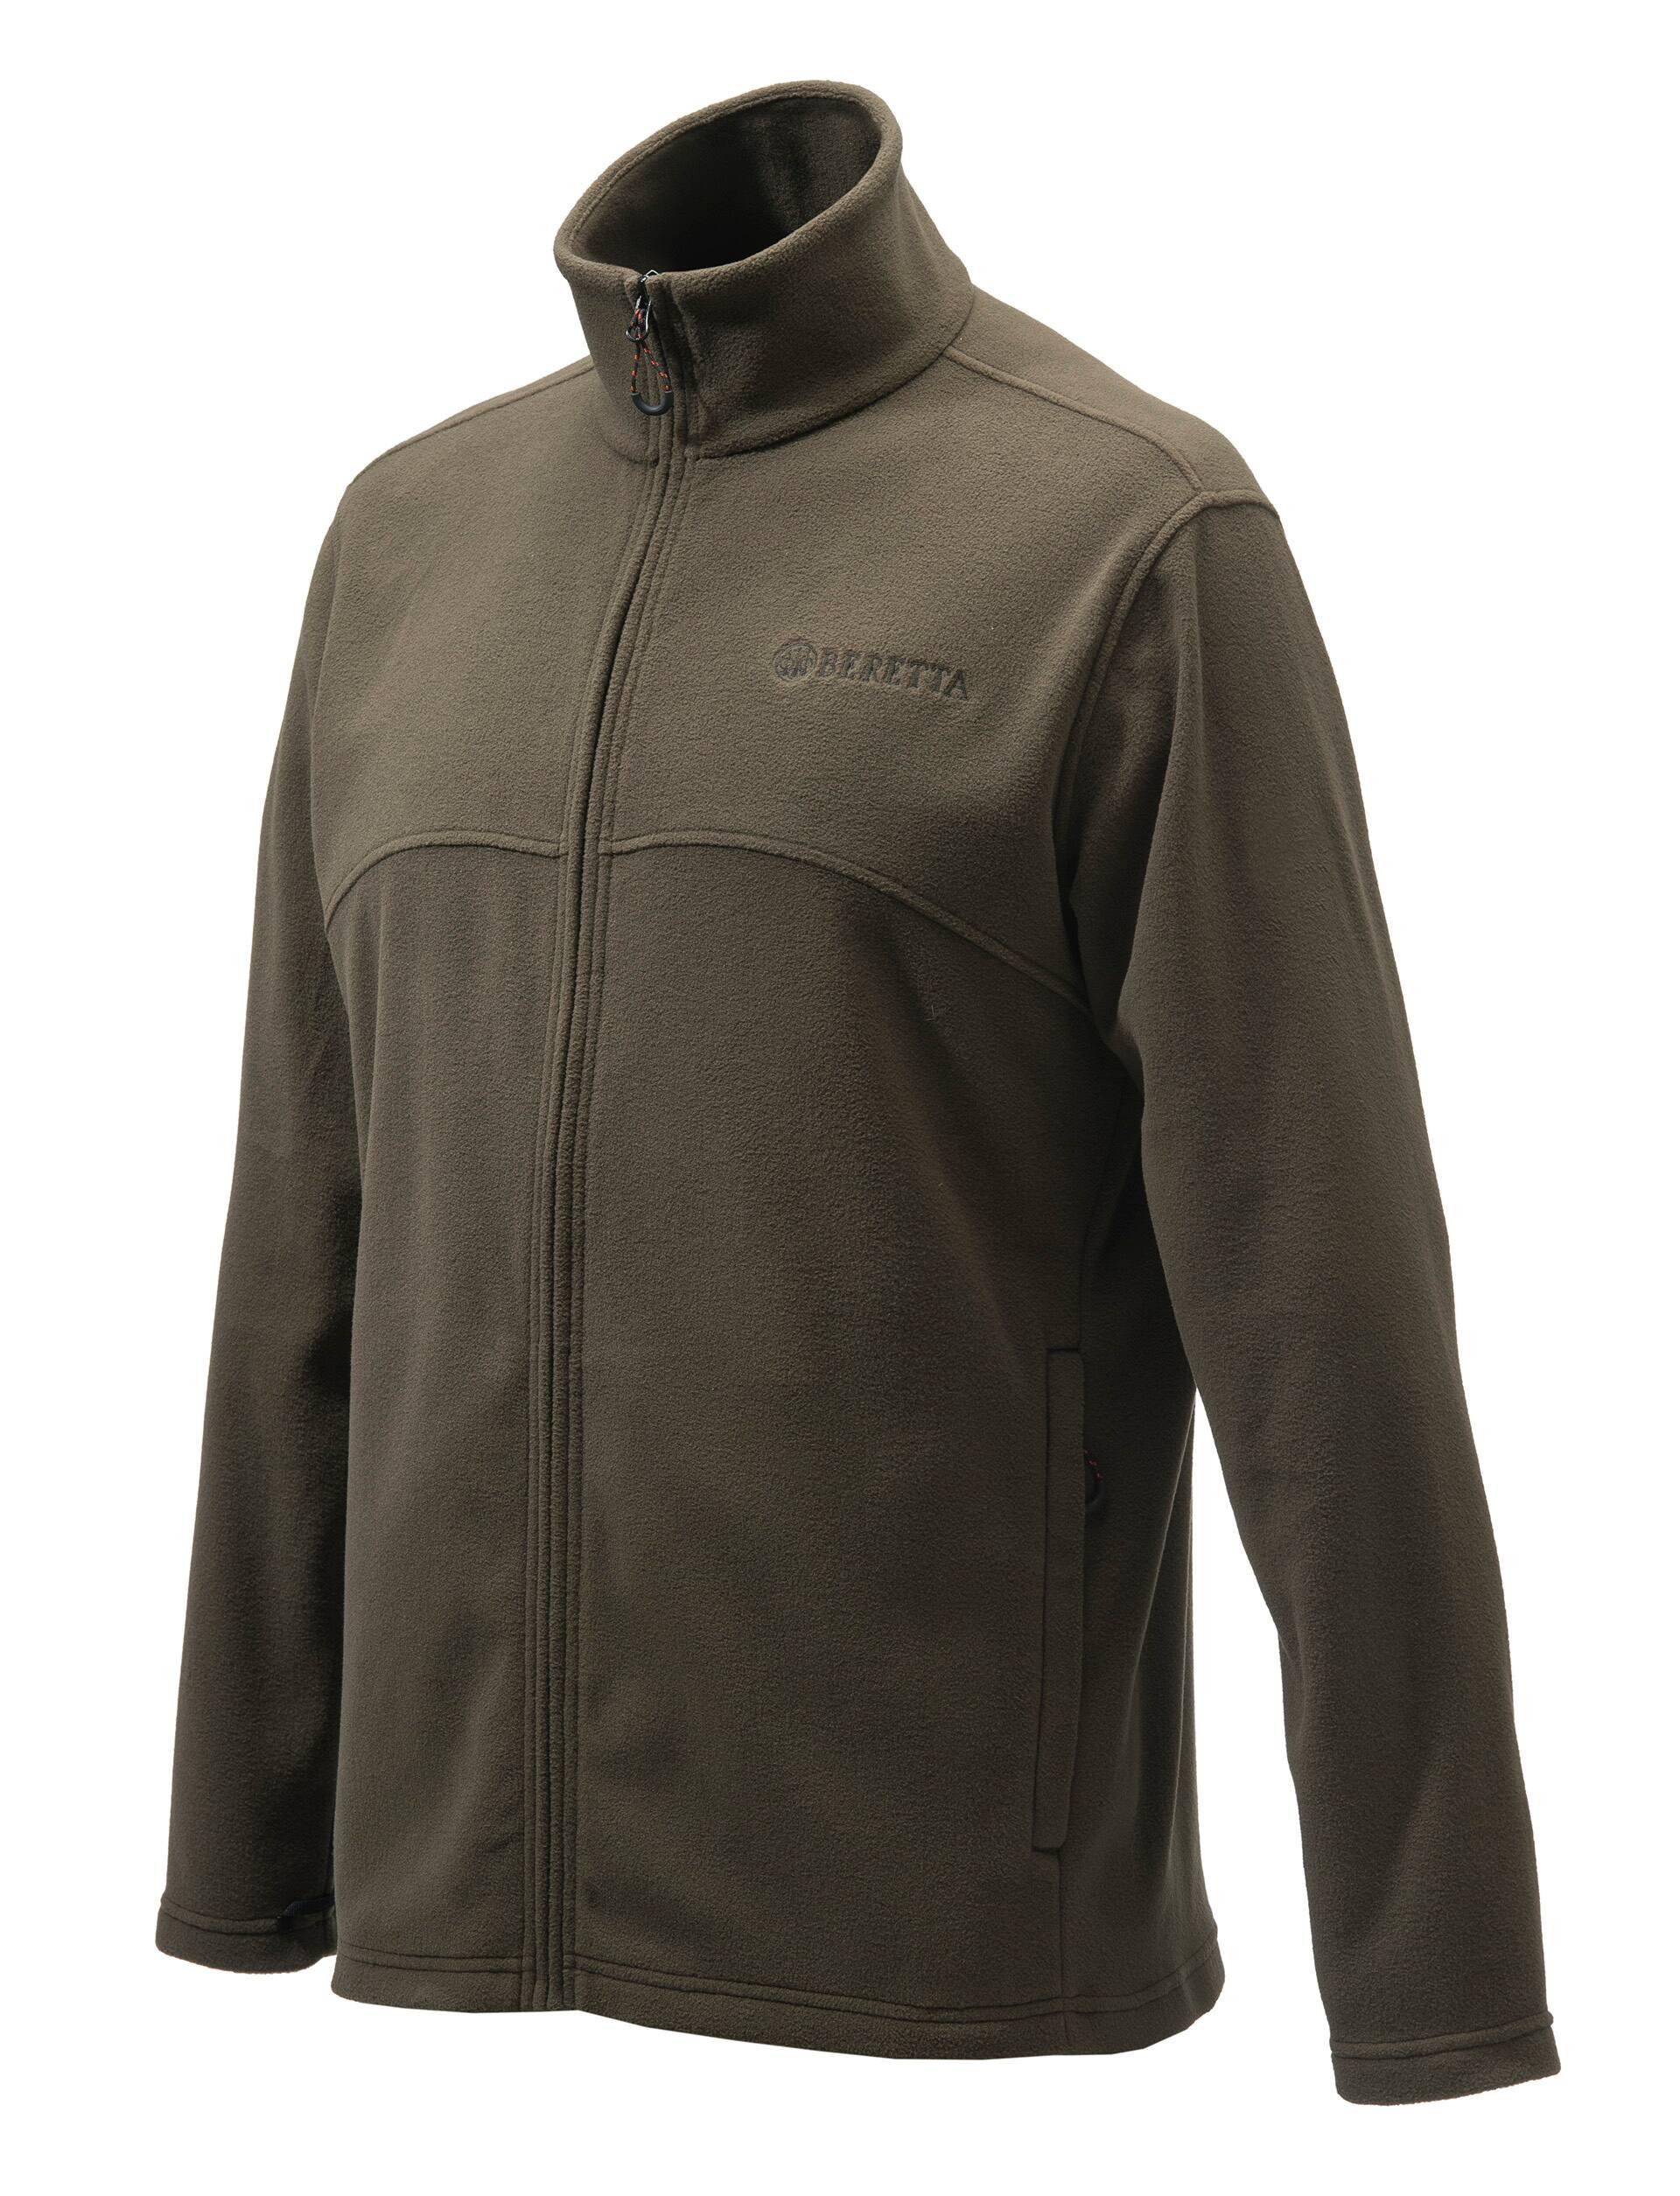 Beretta Men's Clothing: Trail Long Sleeve Shirt $21.25, Full Zip Fleece